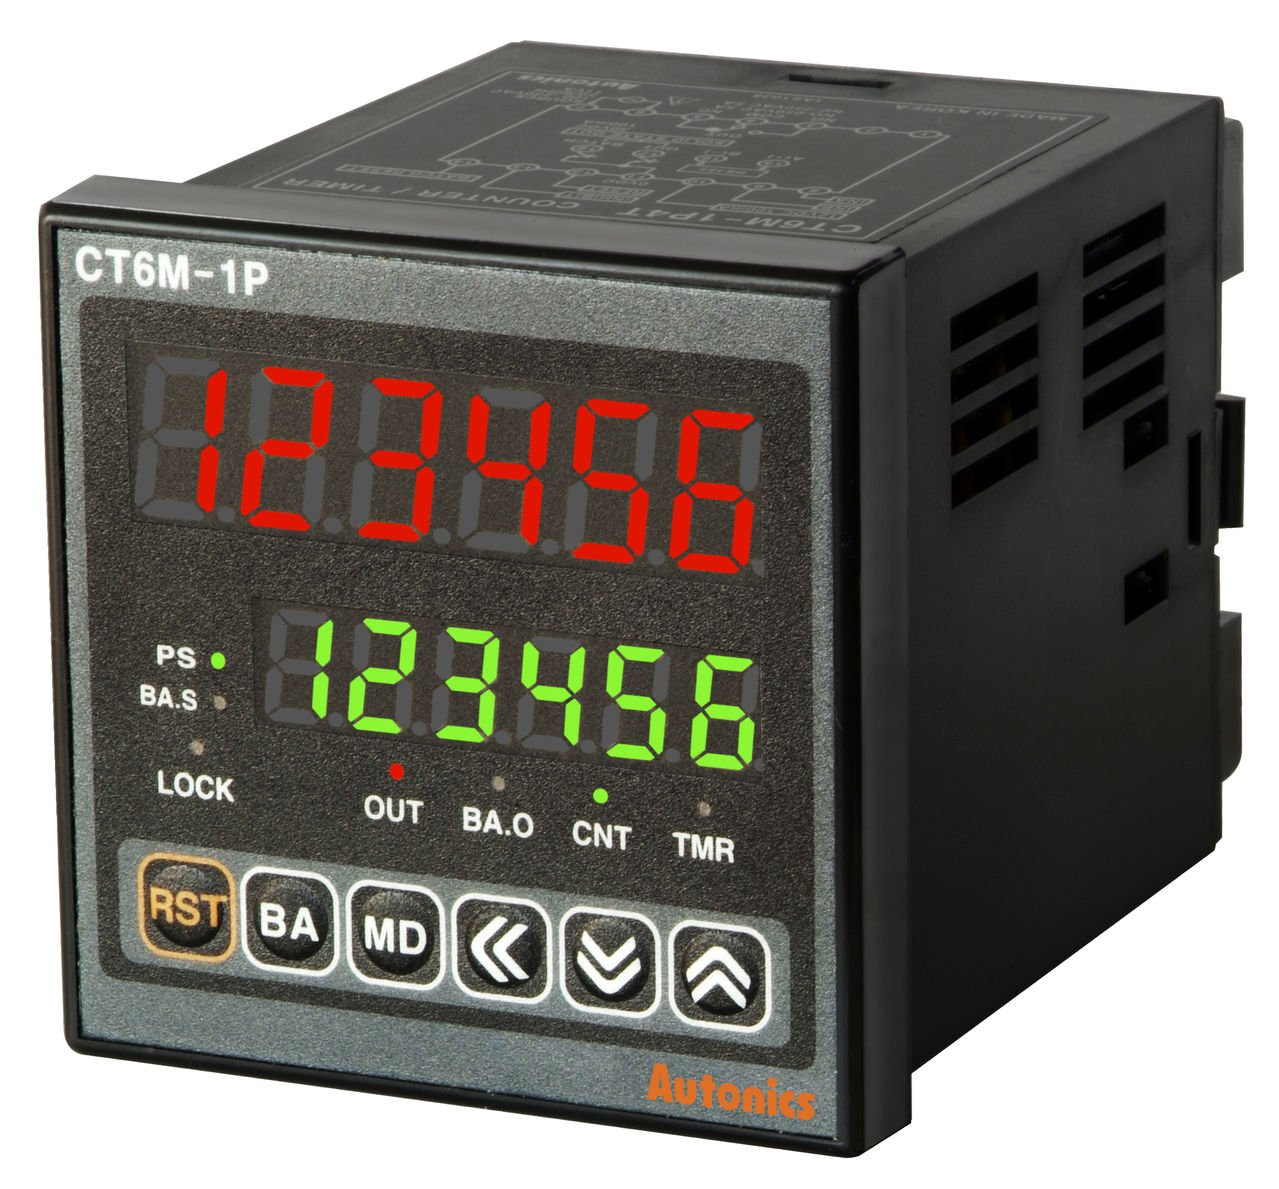 AUTONICS CT6M-2P4 Counter&Timer, W72xH72mm, 6-Digit, LED, 2 Preset, 2 Relay & 3 NPN Output,100-240 VAC.. by Autonics USA, Inc